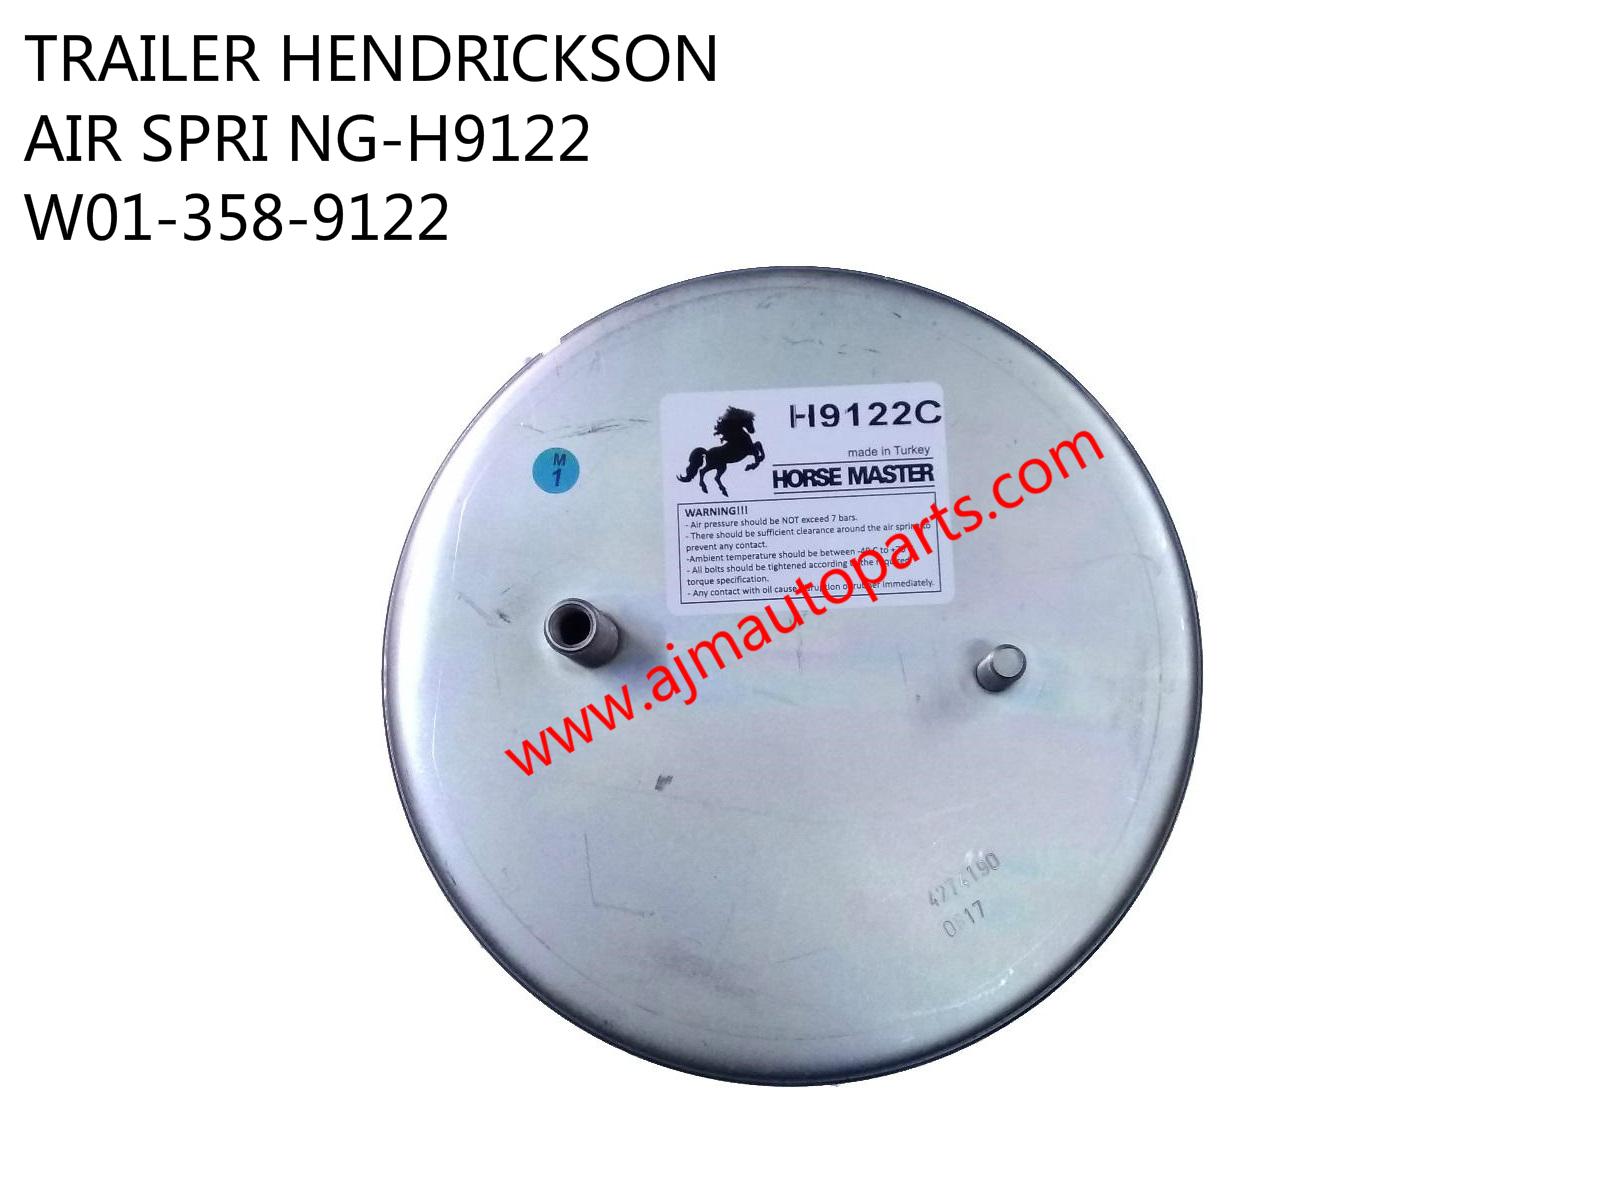 TRAILER HENDRICKSON AIR SPRING-H9122 W013589122